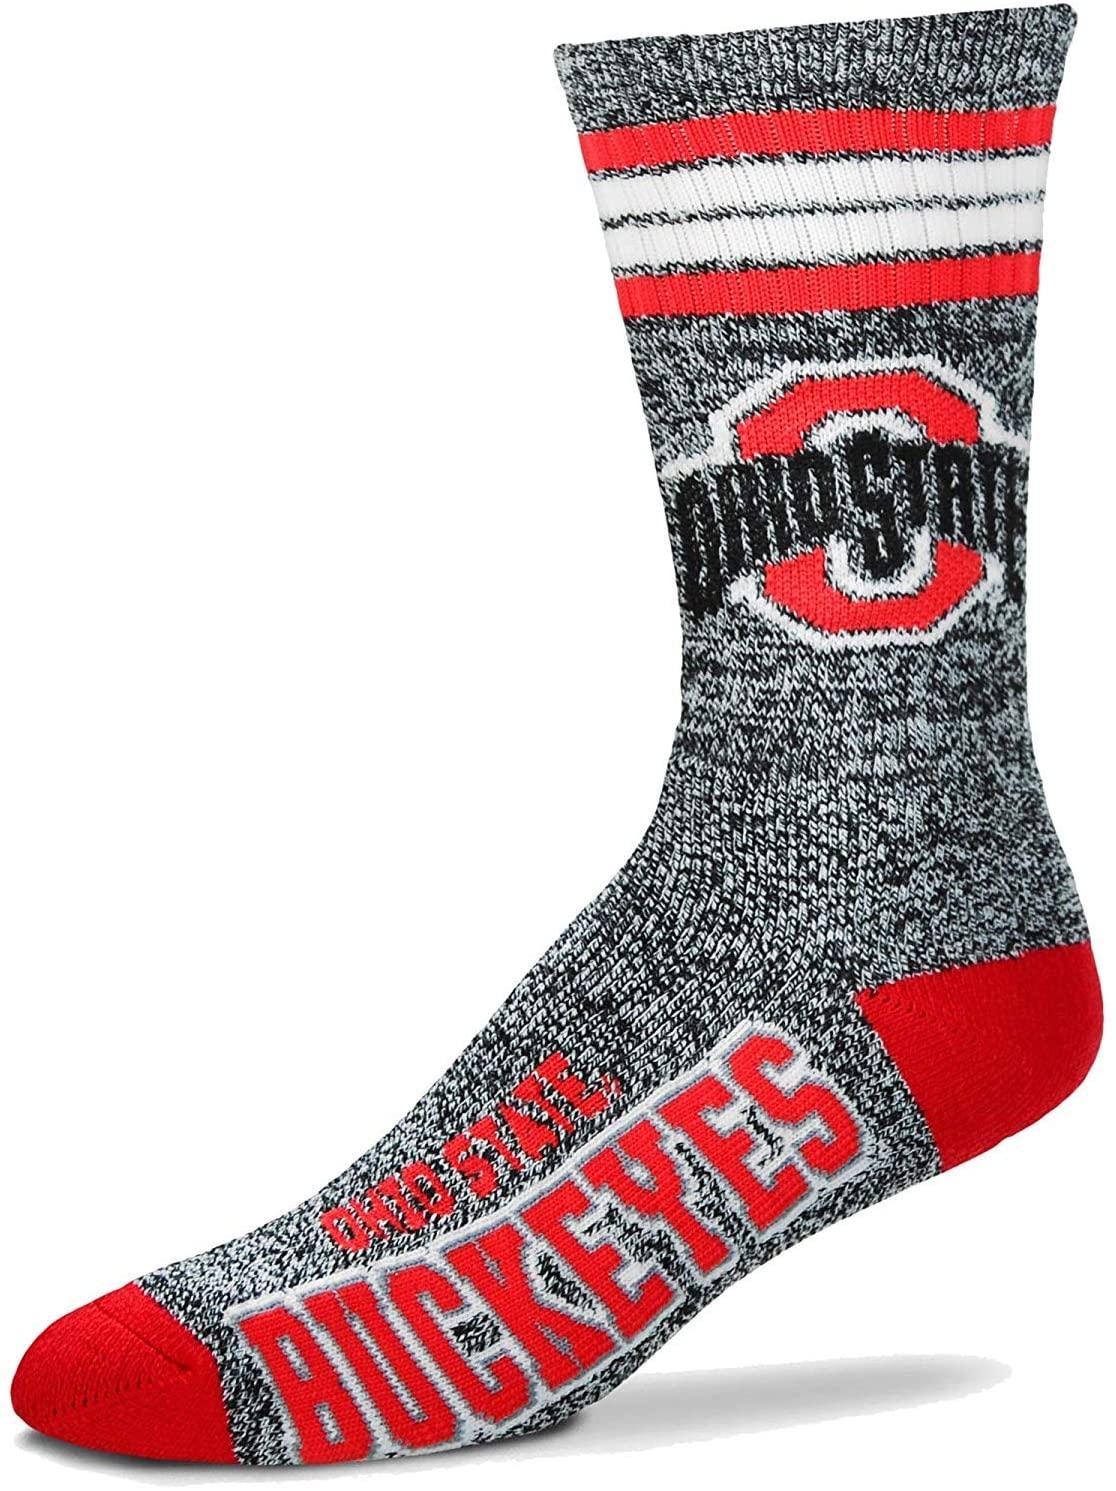 For Bare Feet - Got Marbled Ohio State Buckeyes 4 Stripe Deuce Socks Mens Size X-Large 13-15 XL